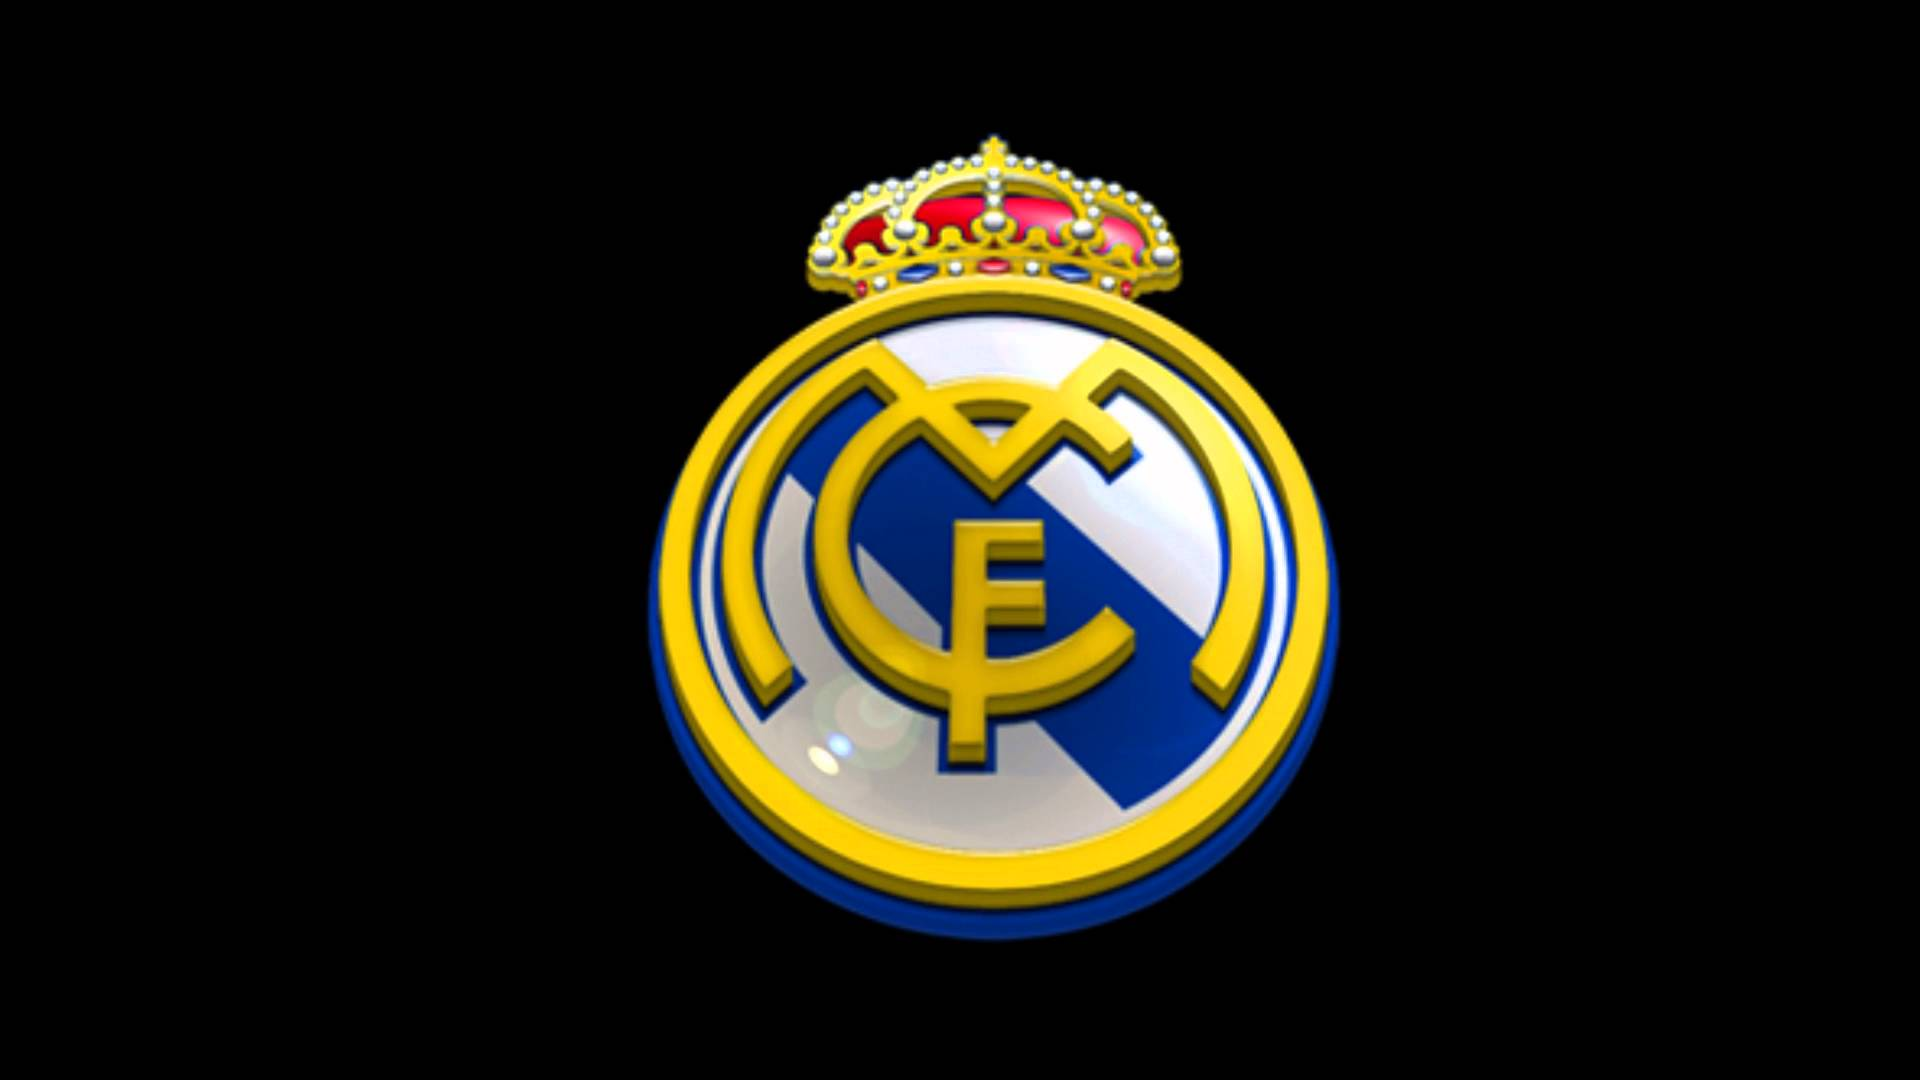 3d Effect Wallpaper For Mobile Real Madrid Wallpaper Hd Free Download Pixelstalk Net